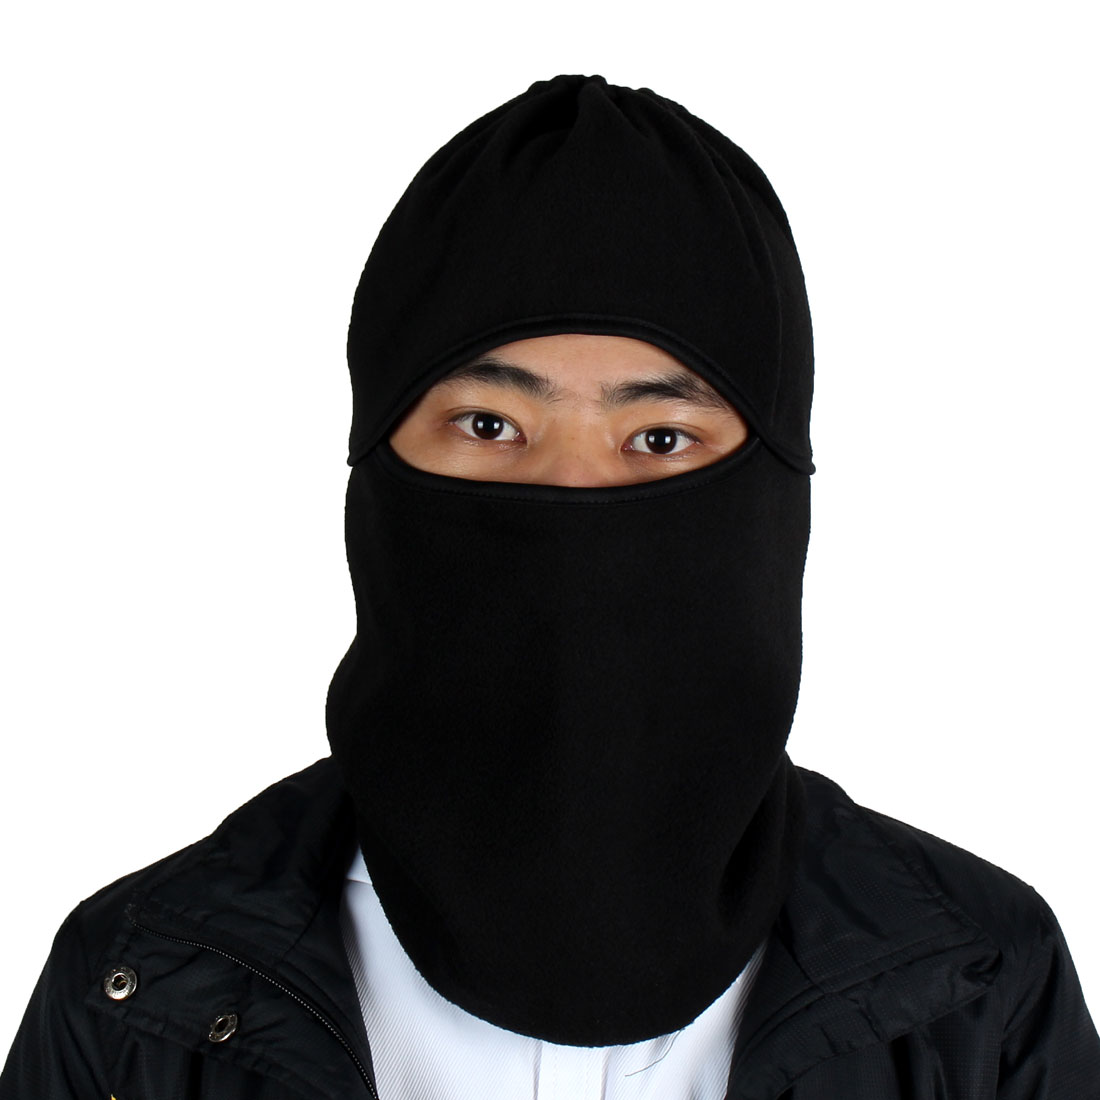 Outdoor Sports Fleece Full Face Mask Cover Neck Protecting Hood Balaclava Black